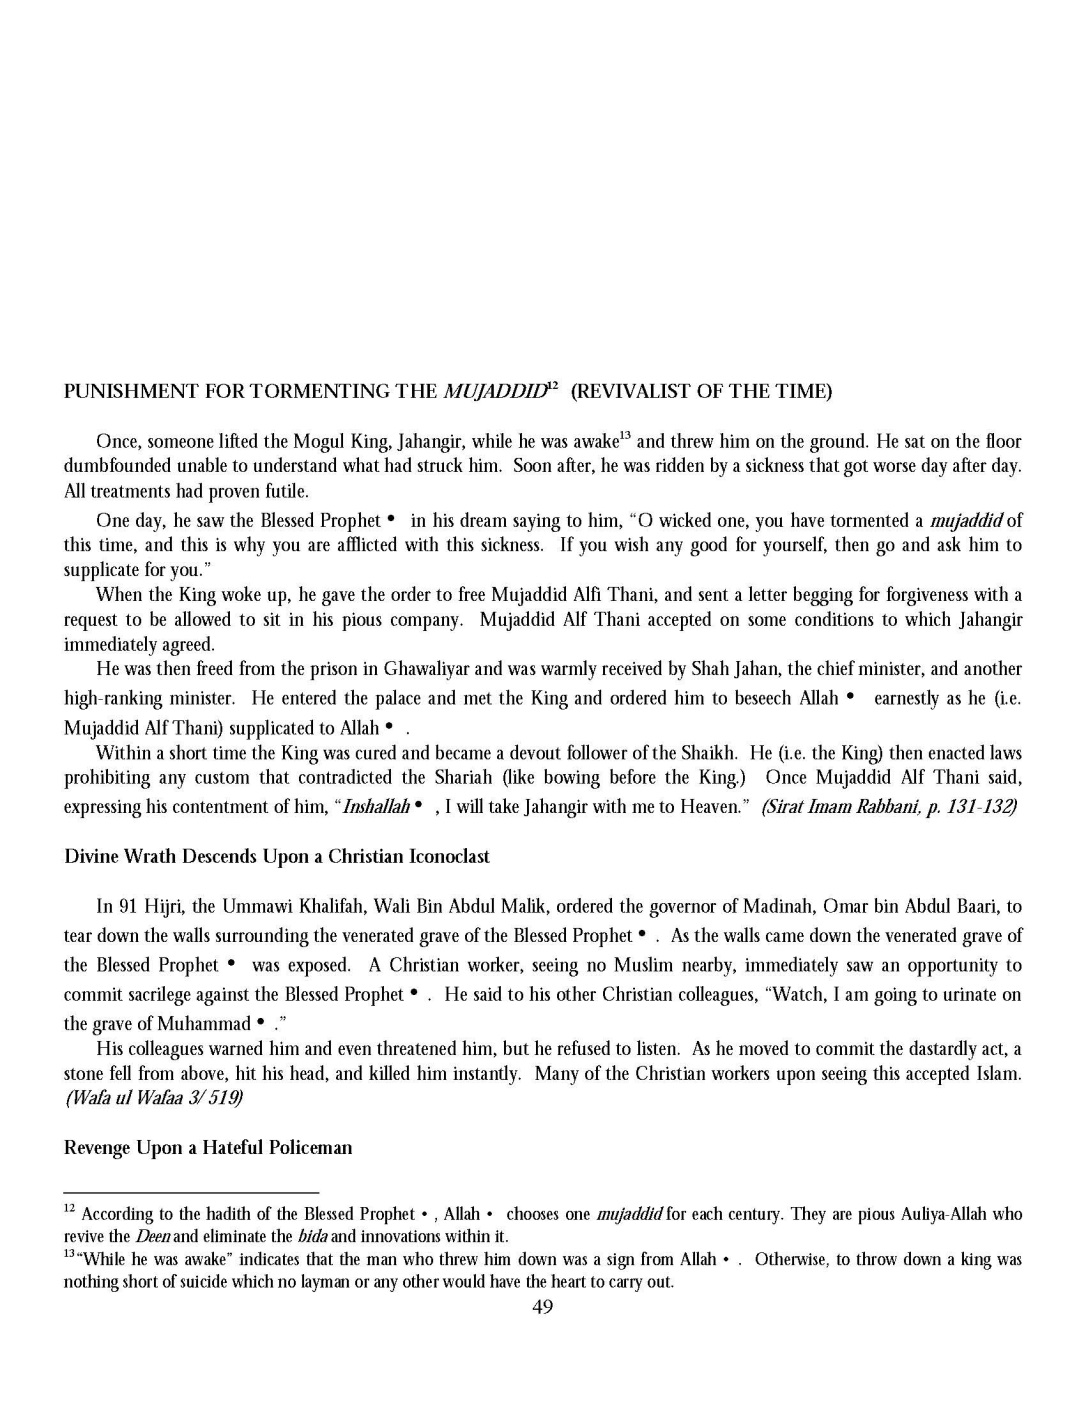 ConsequencesOfDebasingAuliyaAllah_Page_50